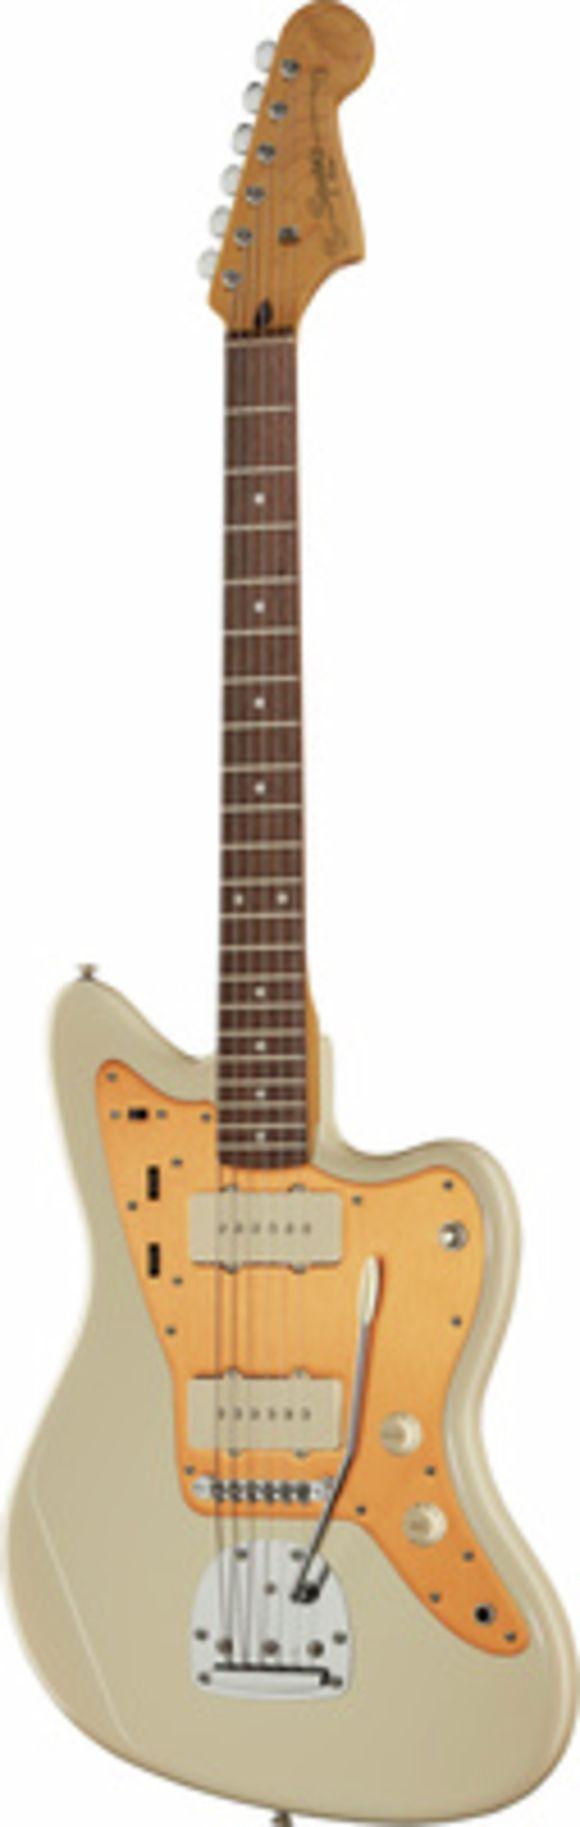 SQ J.Mascis Jazzmaster 2018 Fender